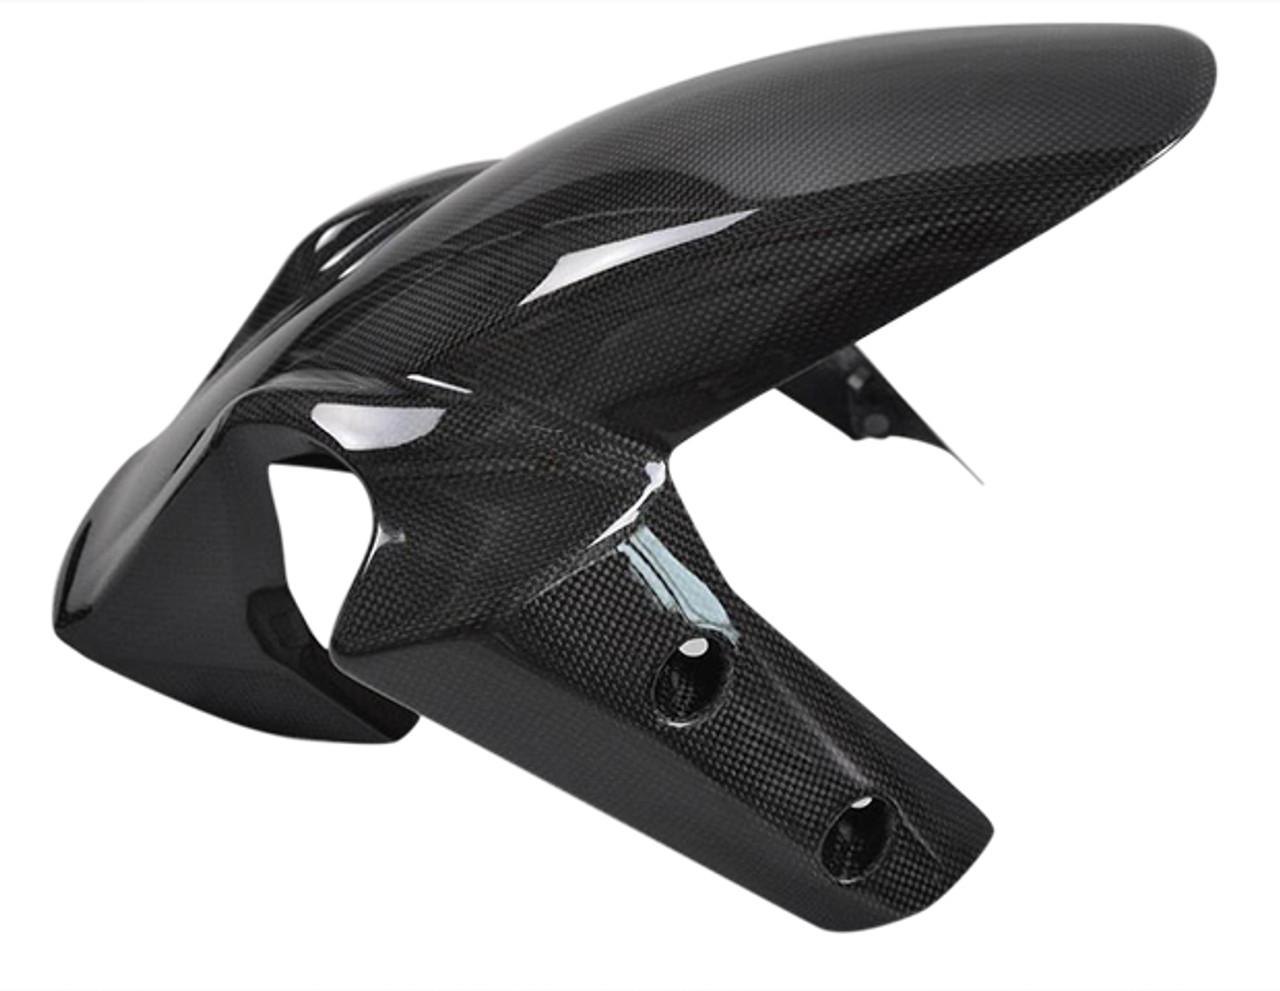 Glossy Plain Weave Carbon Fiber Front Fender for Ducati Multistrada 1200